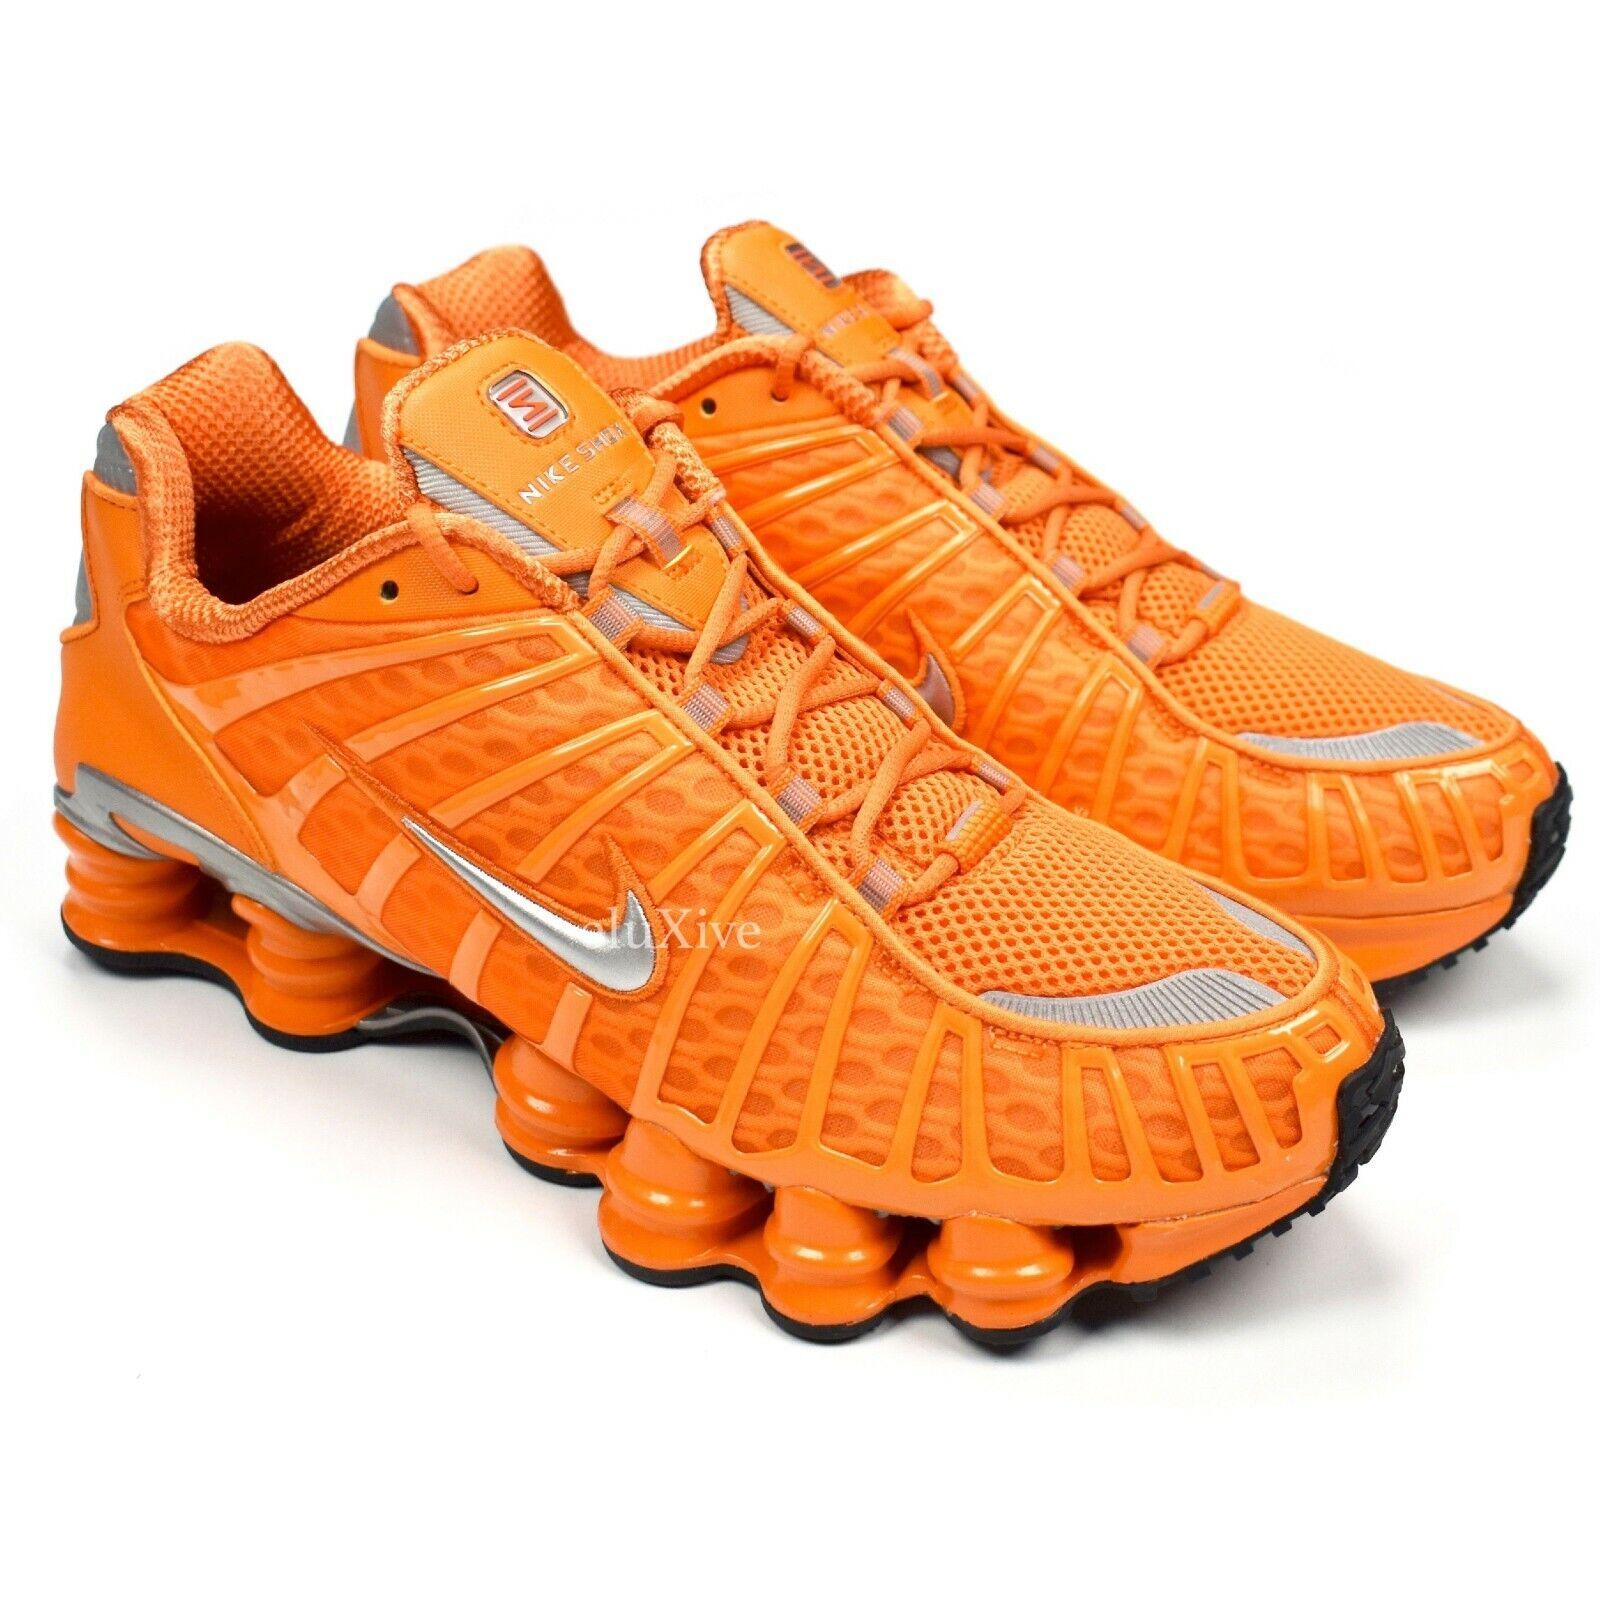 f9f794975d7 Nike Air Jordan 1 Retro HIGH BAN Size 12 432001-001 BANNED BRED ROYAL B  GRADE C